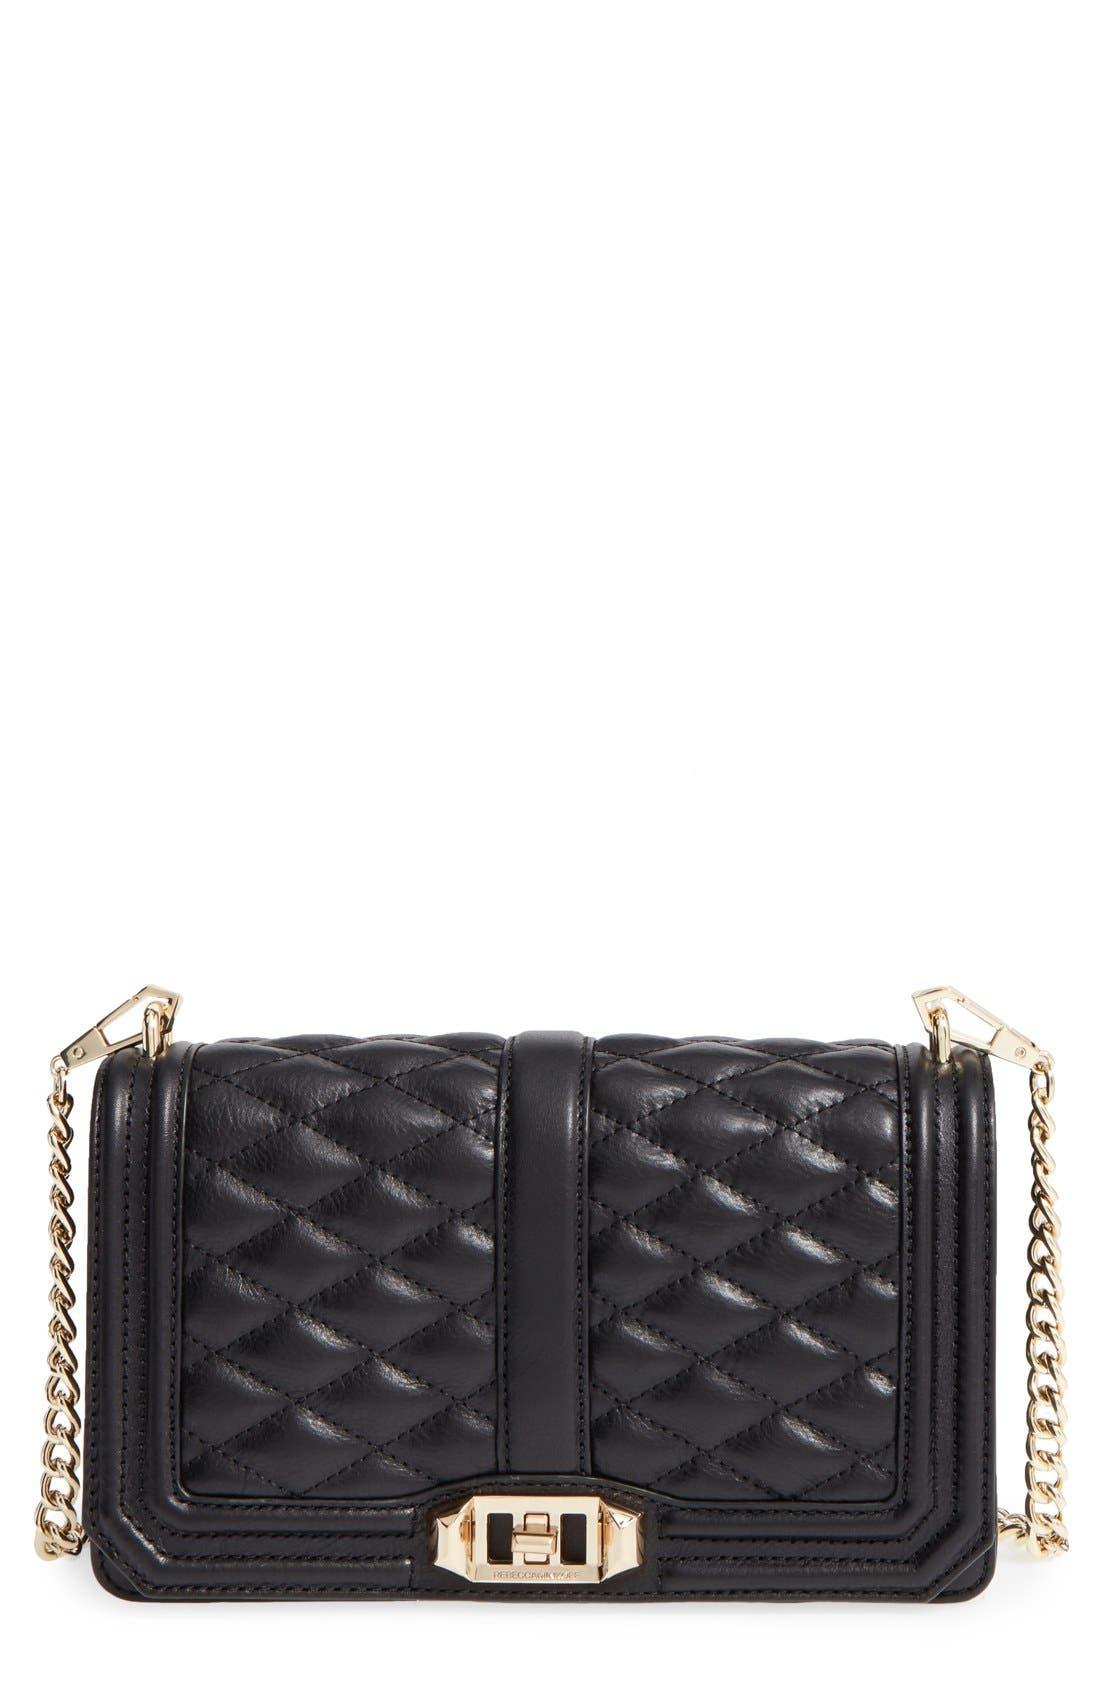 Rebecca Minkoff Love Leather Crossbody Bag